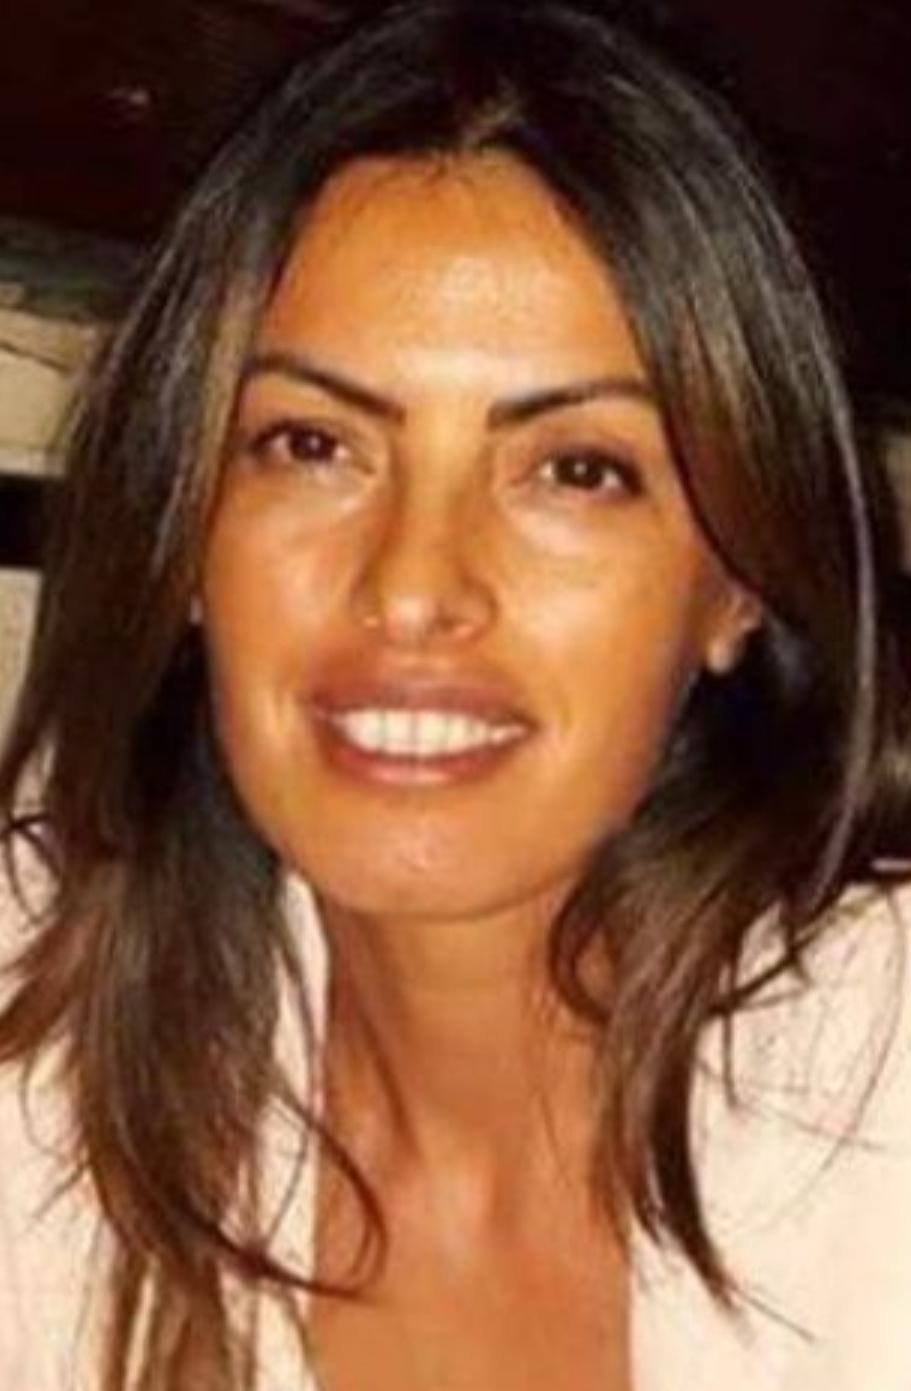 Nergiz Varli(Istanbul, Turchia) ,la nuova corrispondente di Progetto Radici